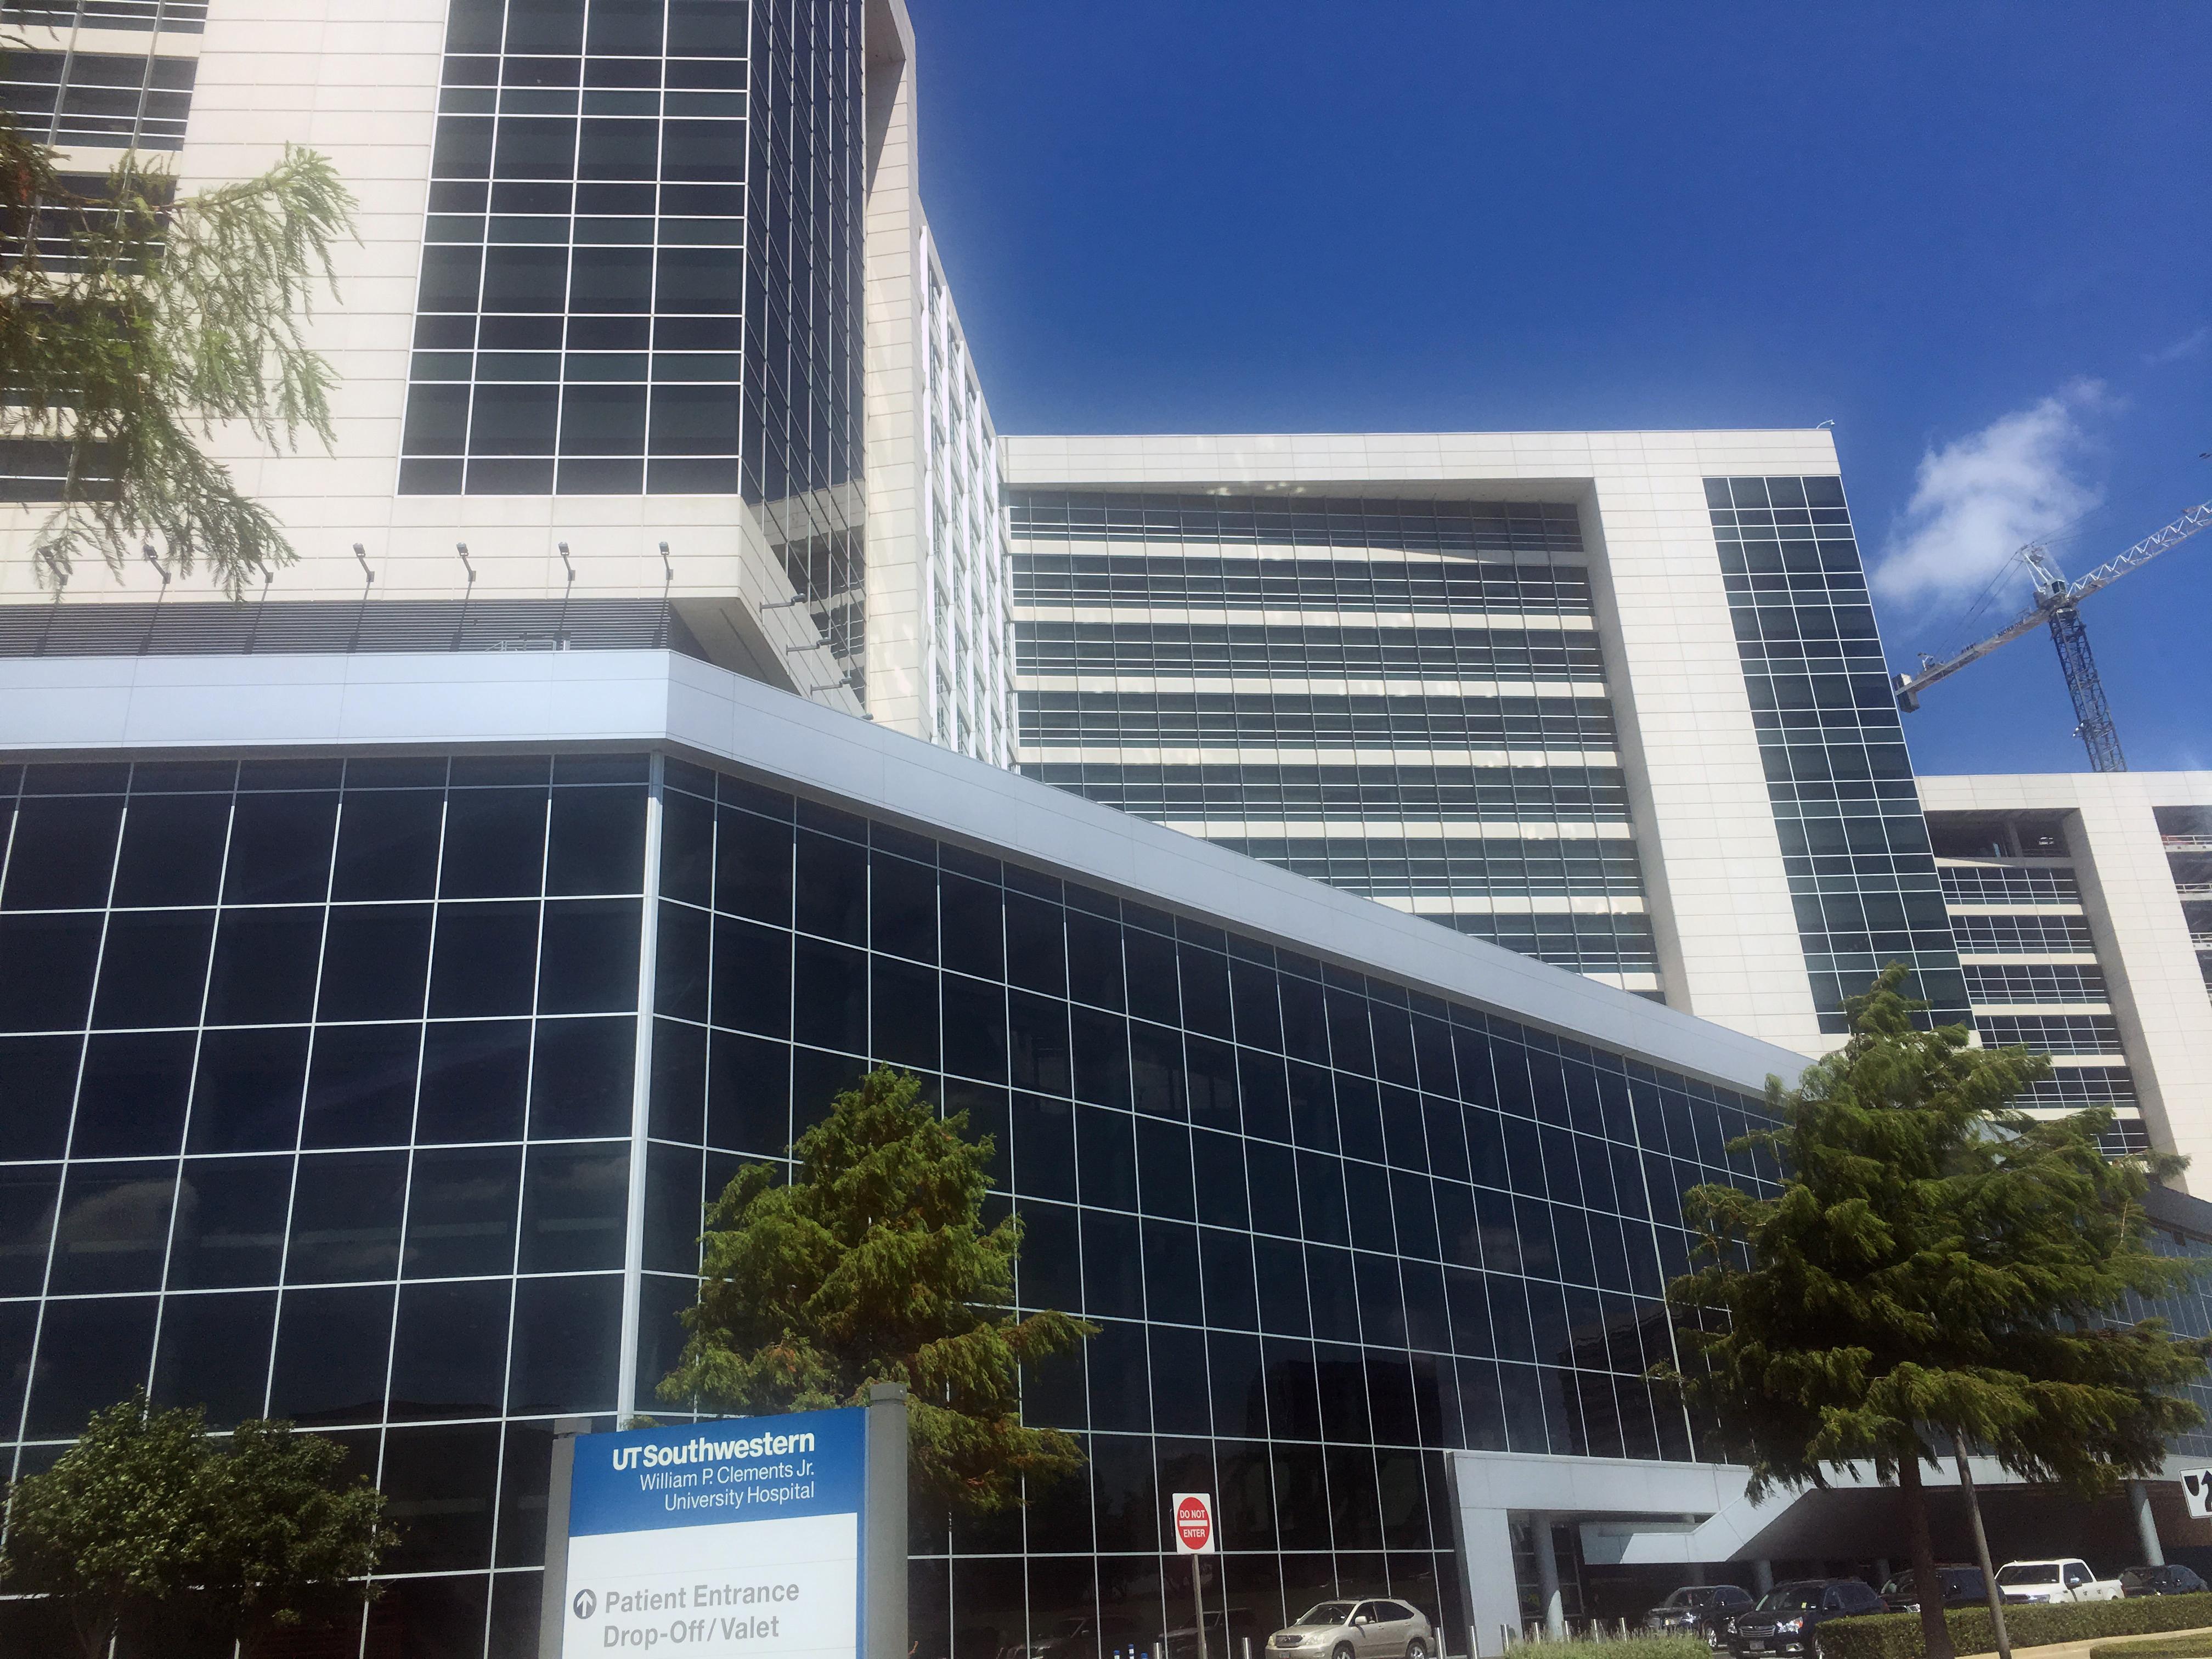 File:William P  Clements Jr  University Hospital Nima3 jpg